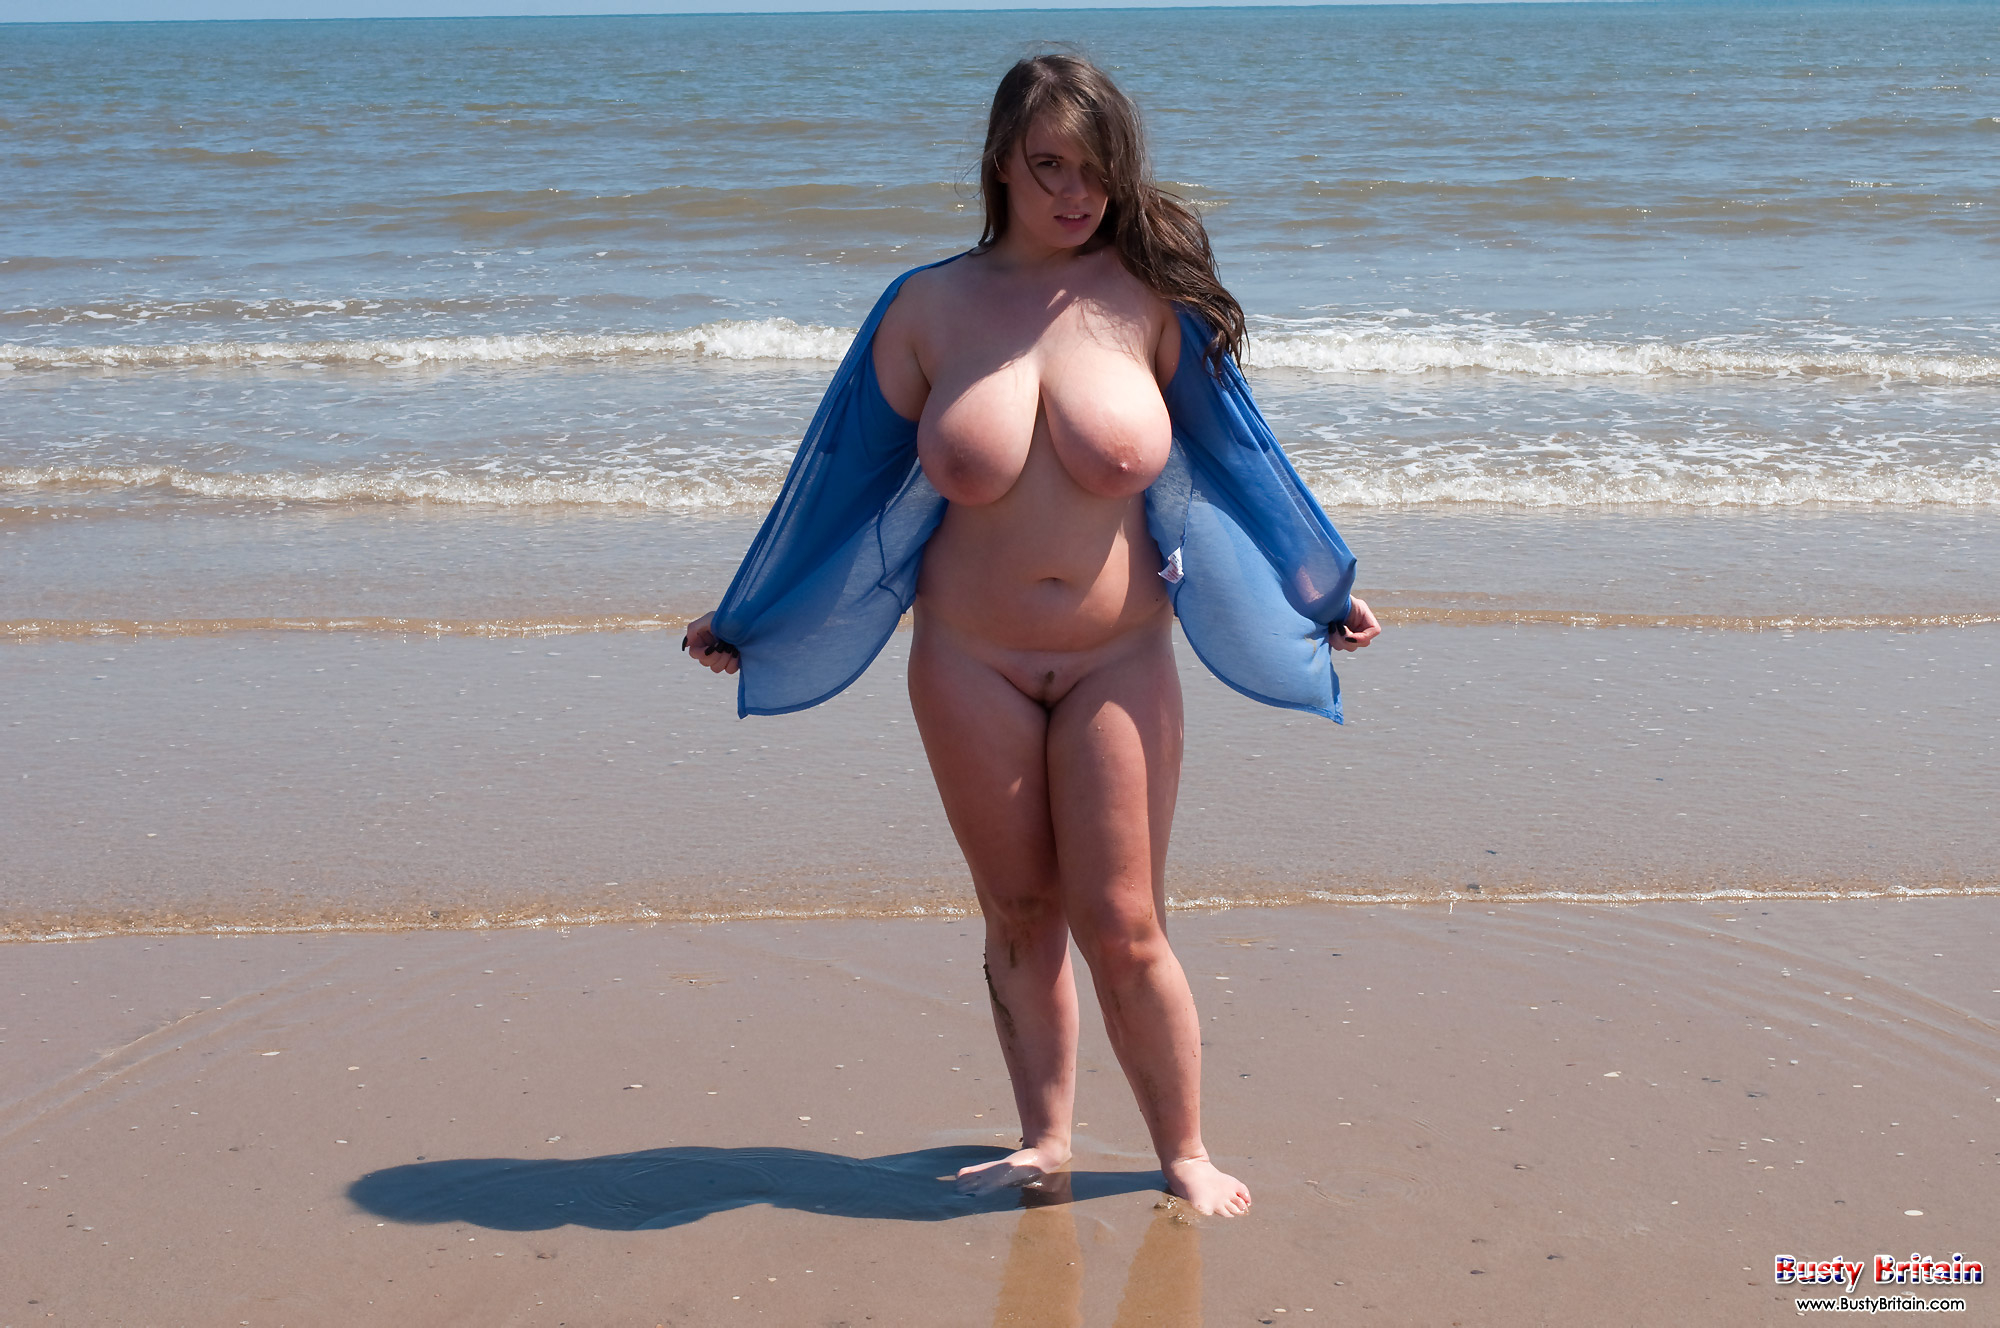 kazakstan girl nude video daylimotion